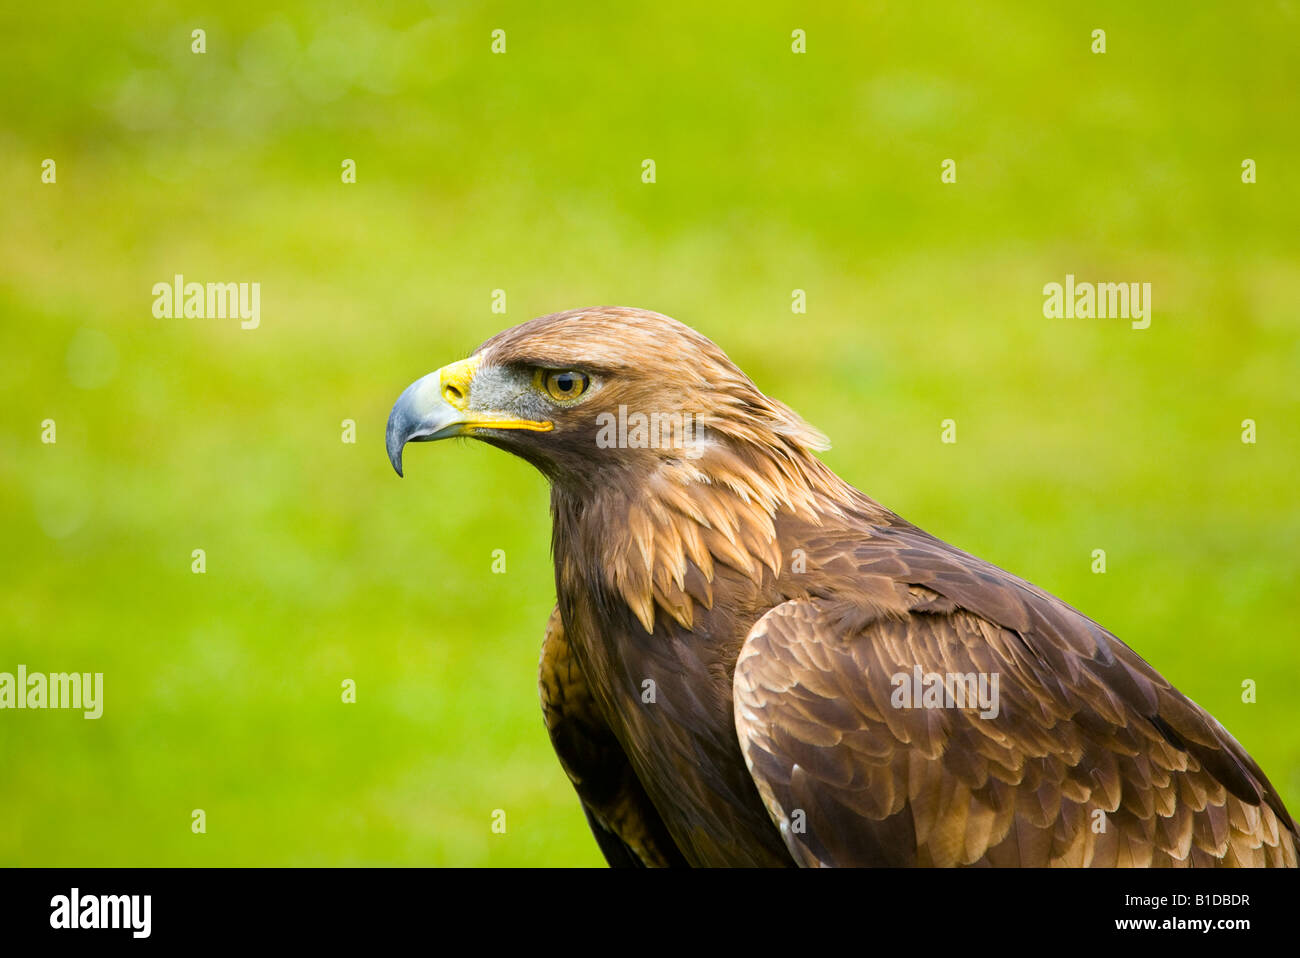 Portrait of Golden Eagle, British Bird of Prey, UK - Stock Image